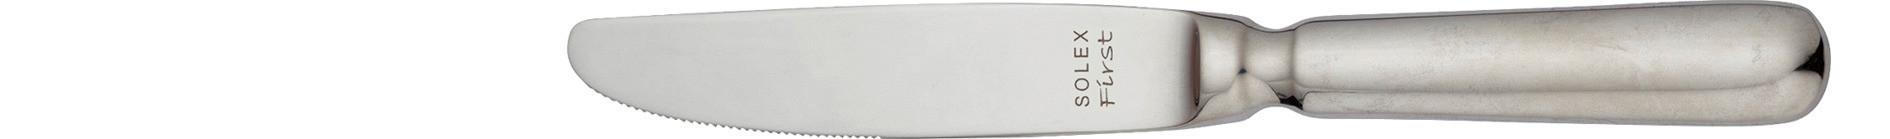 Baguette, Dessertmesser Monoblock 220 mm